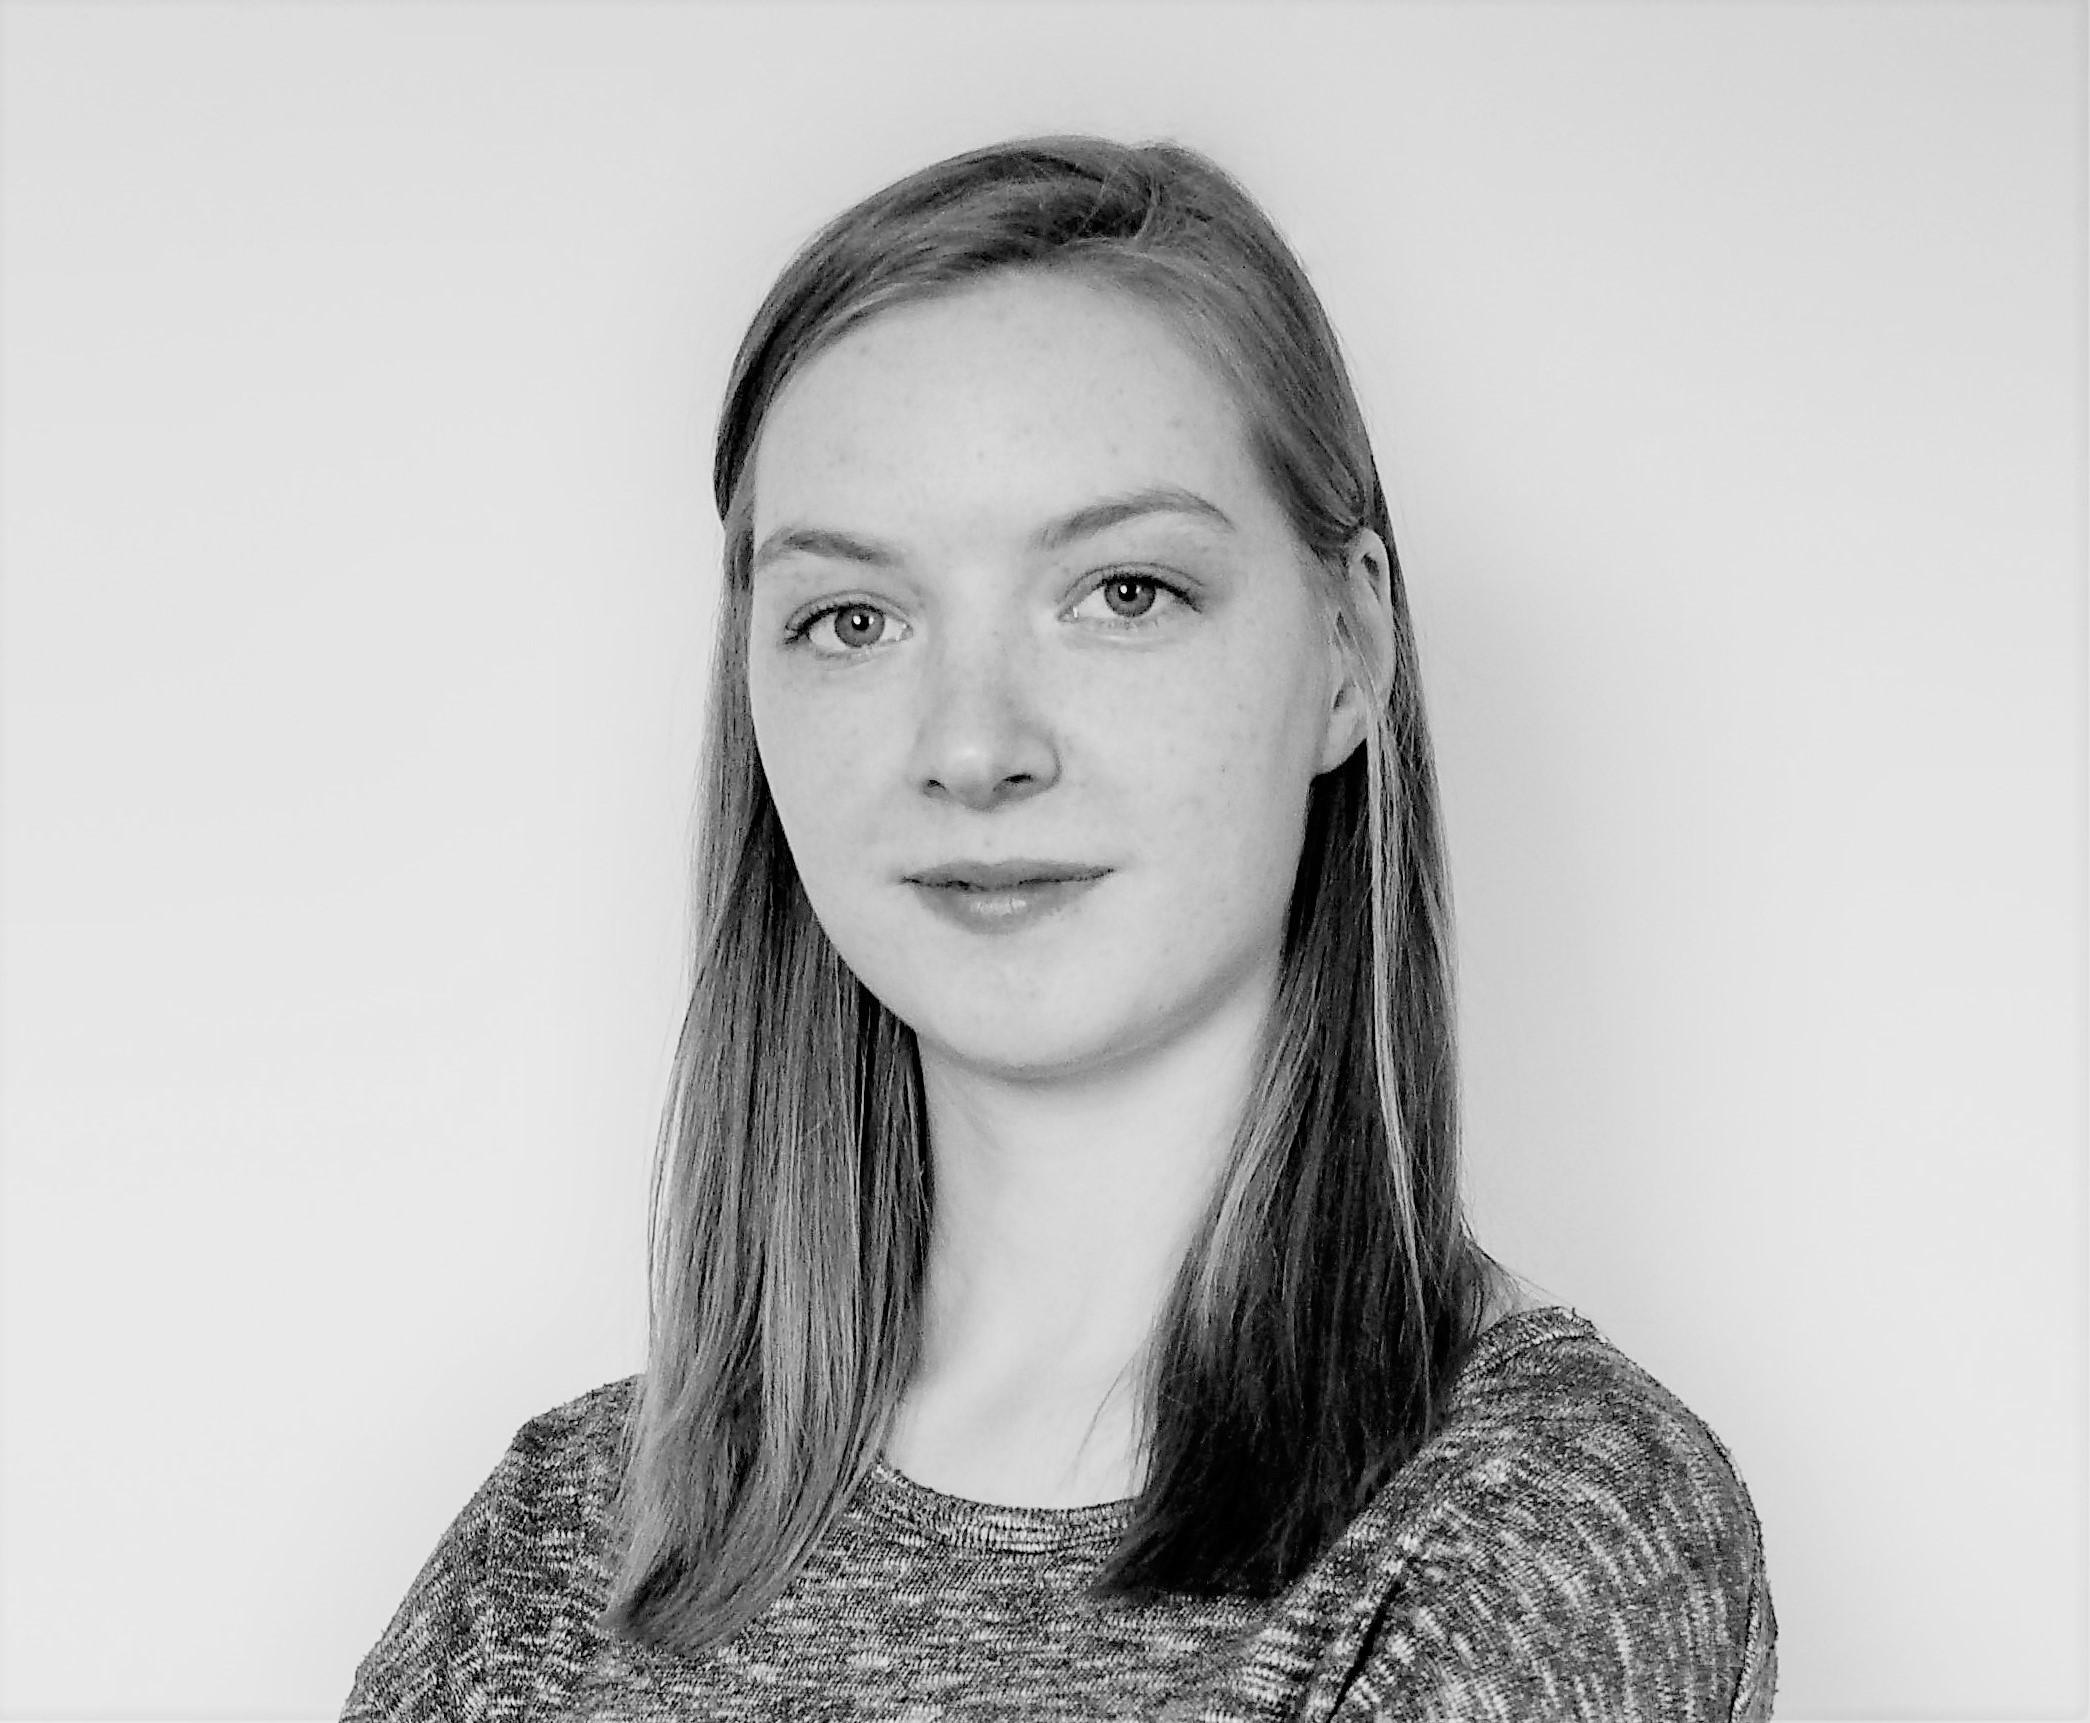 Sophia Röbke